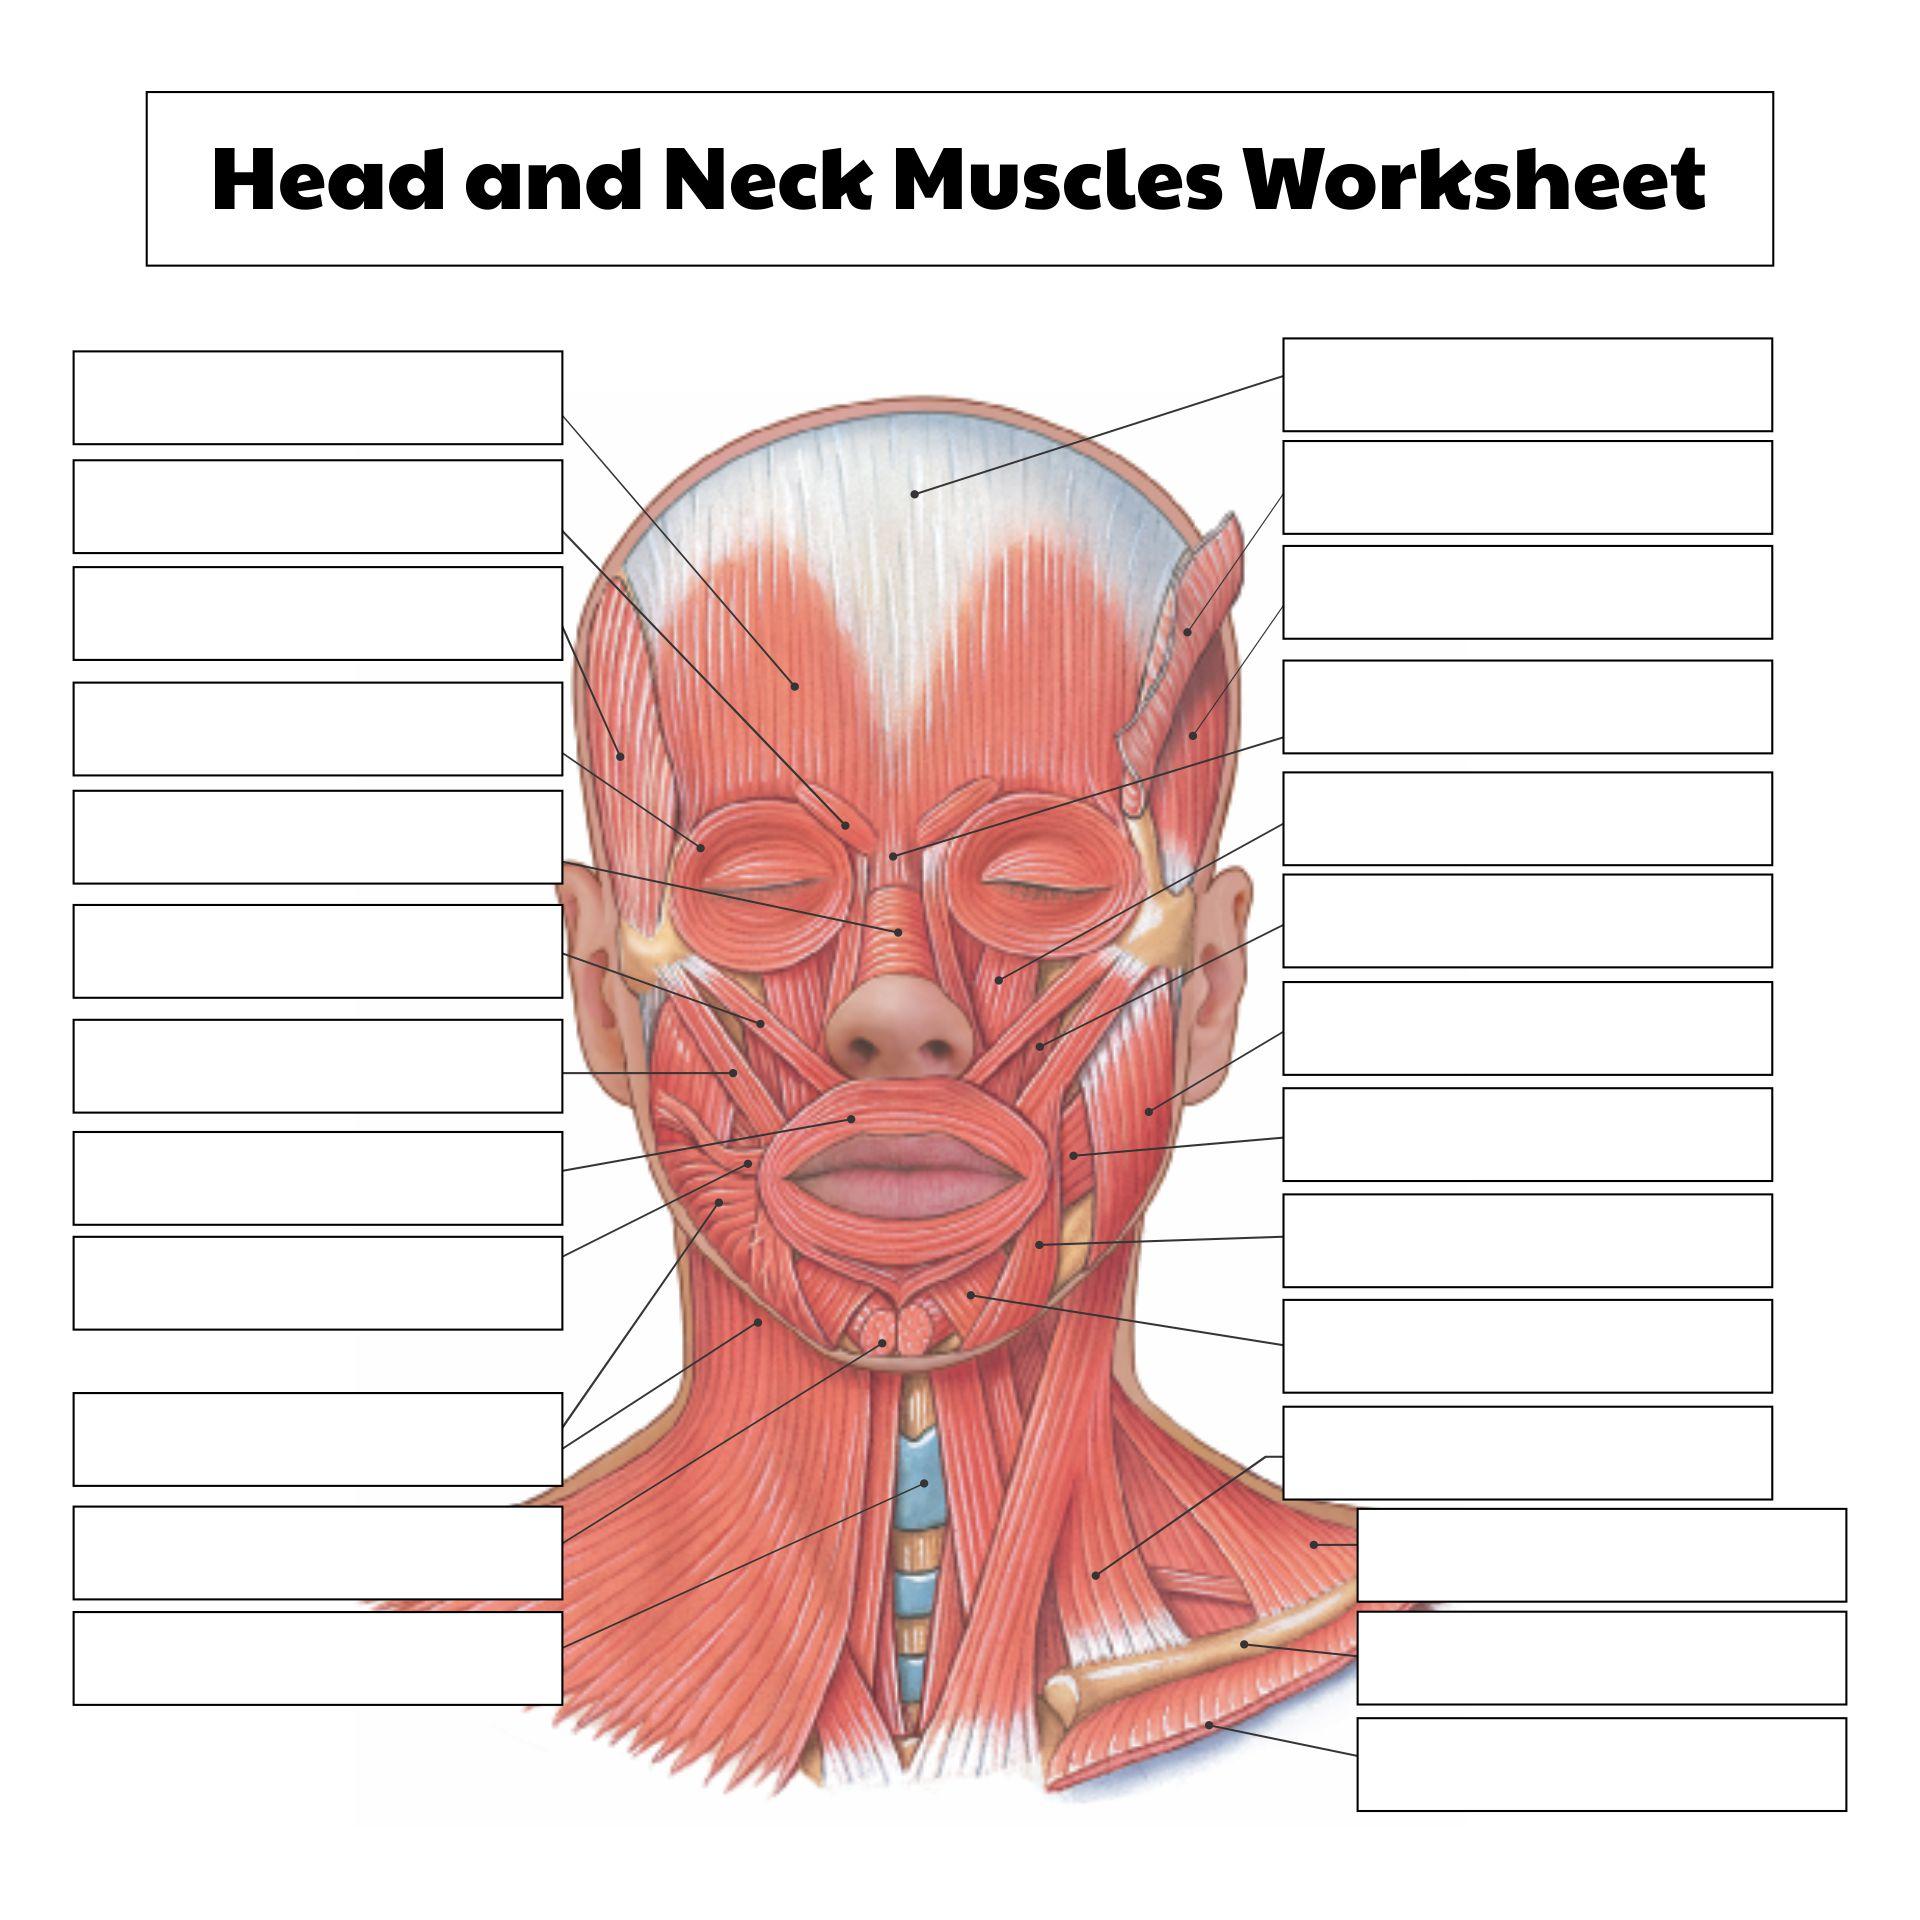 5 Best Images of Printable College Anatomy Worksheets ...